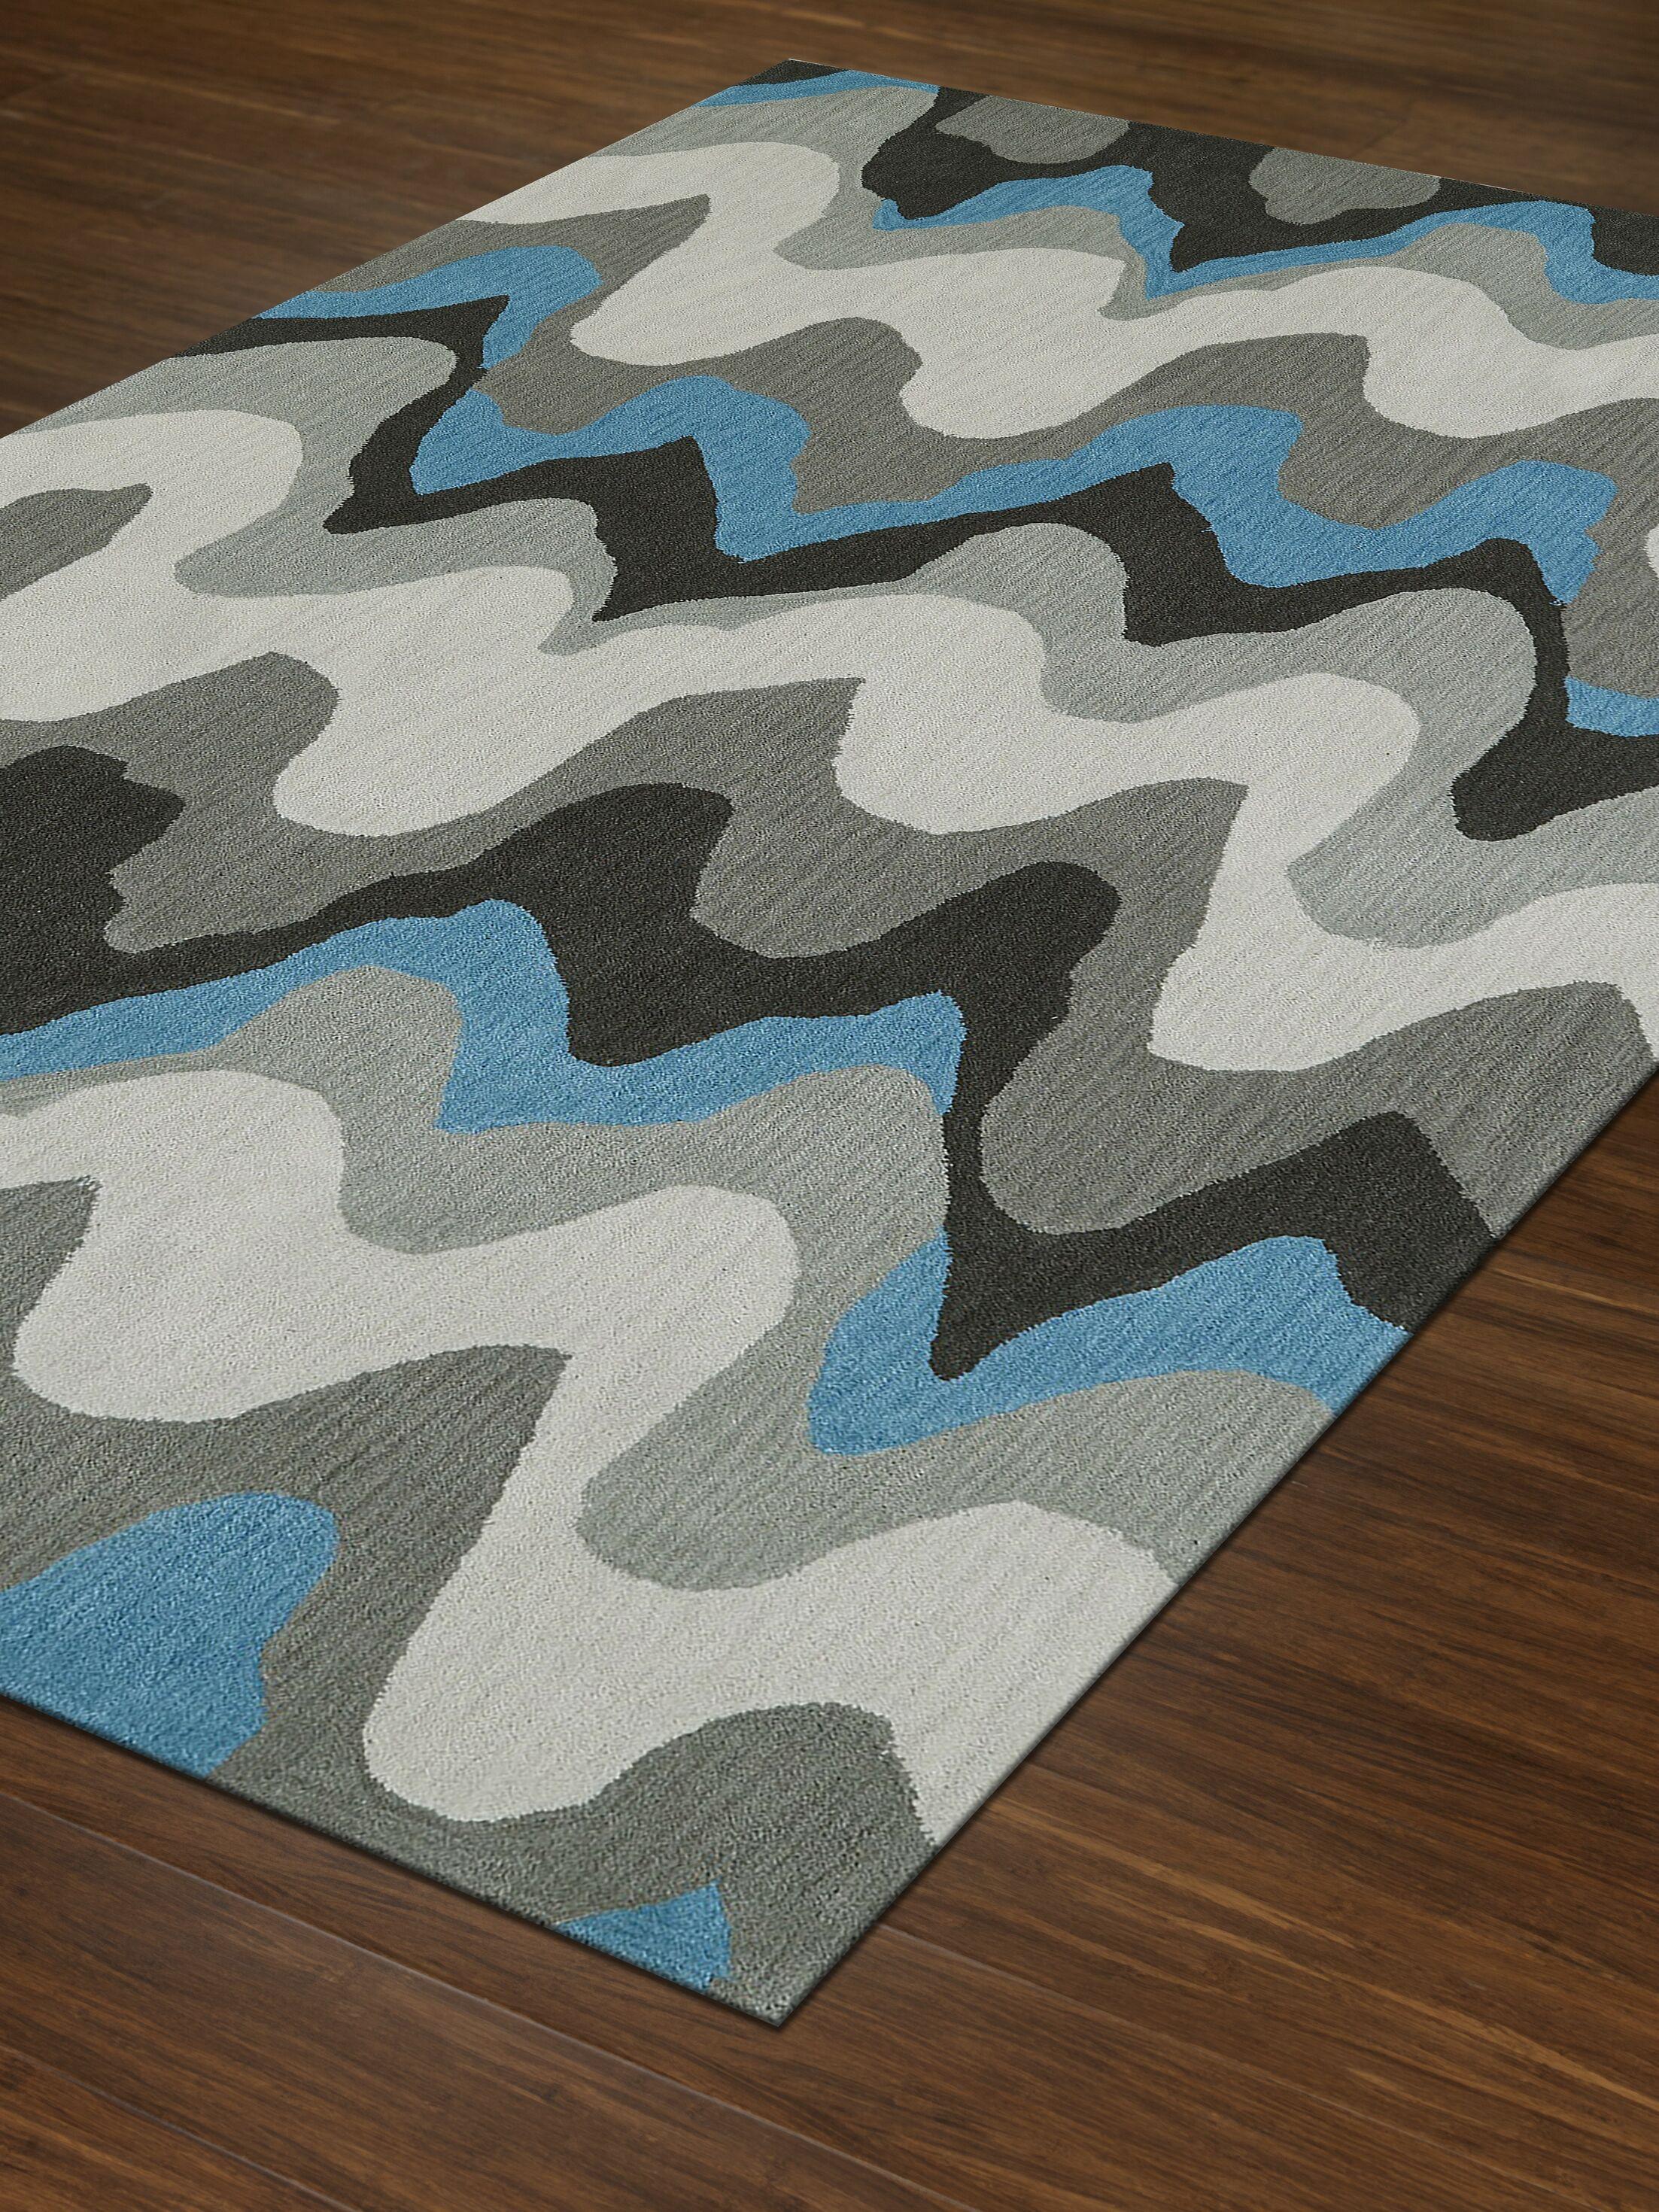 Aloft Silver/Blue Area Rug Rug Size: Rectangle 9' x 13'